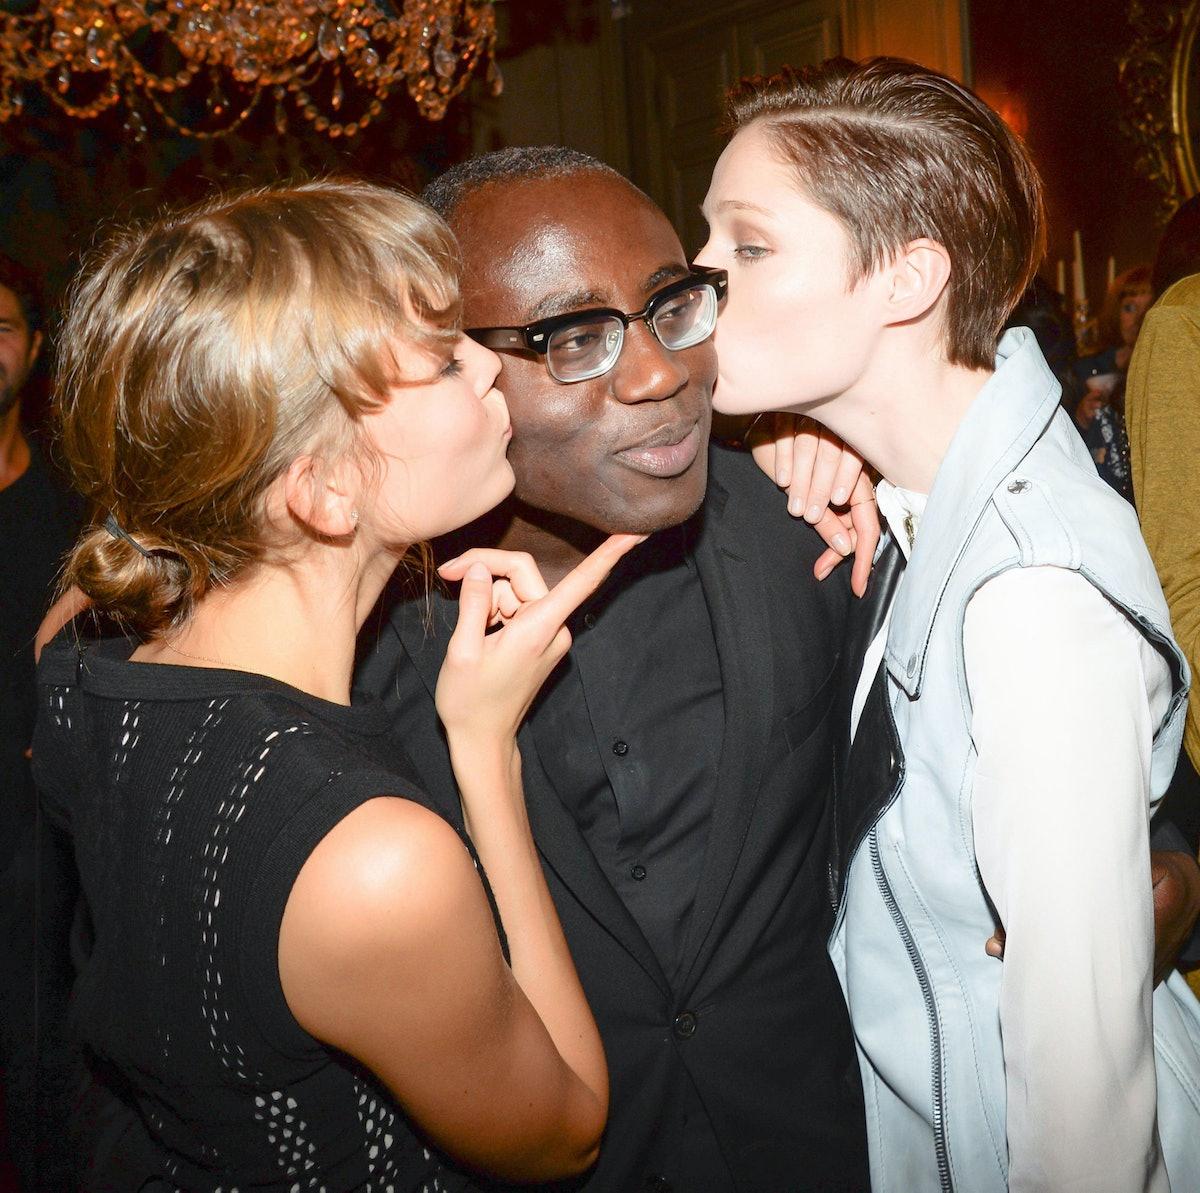 Karlie Kloss, Edward Enninful, and Coco Rocha. Photo by BFAnyc.com.